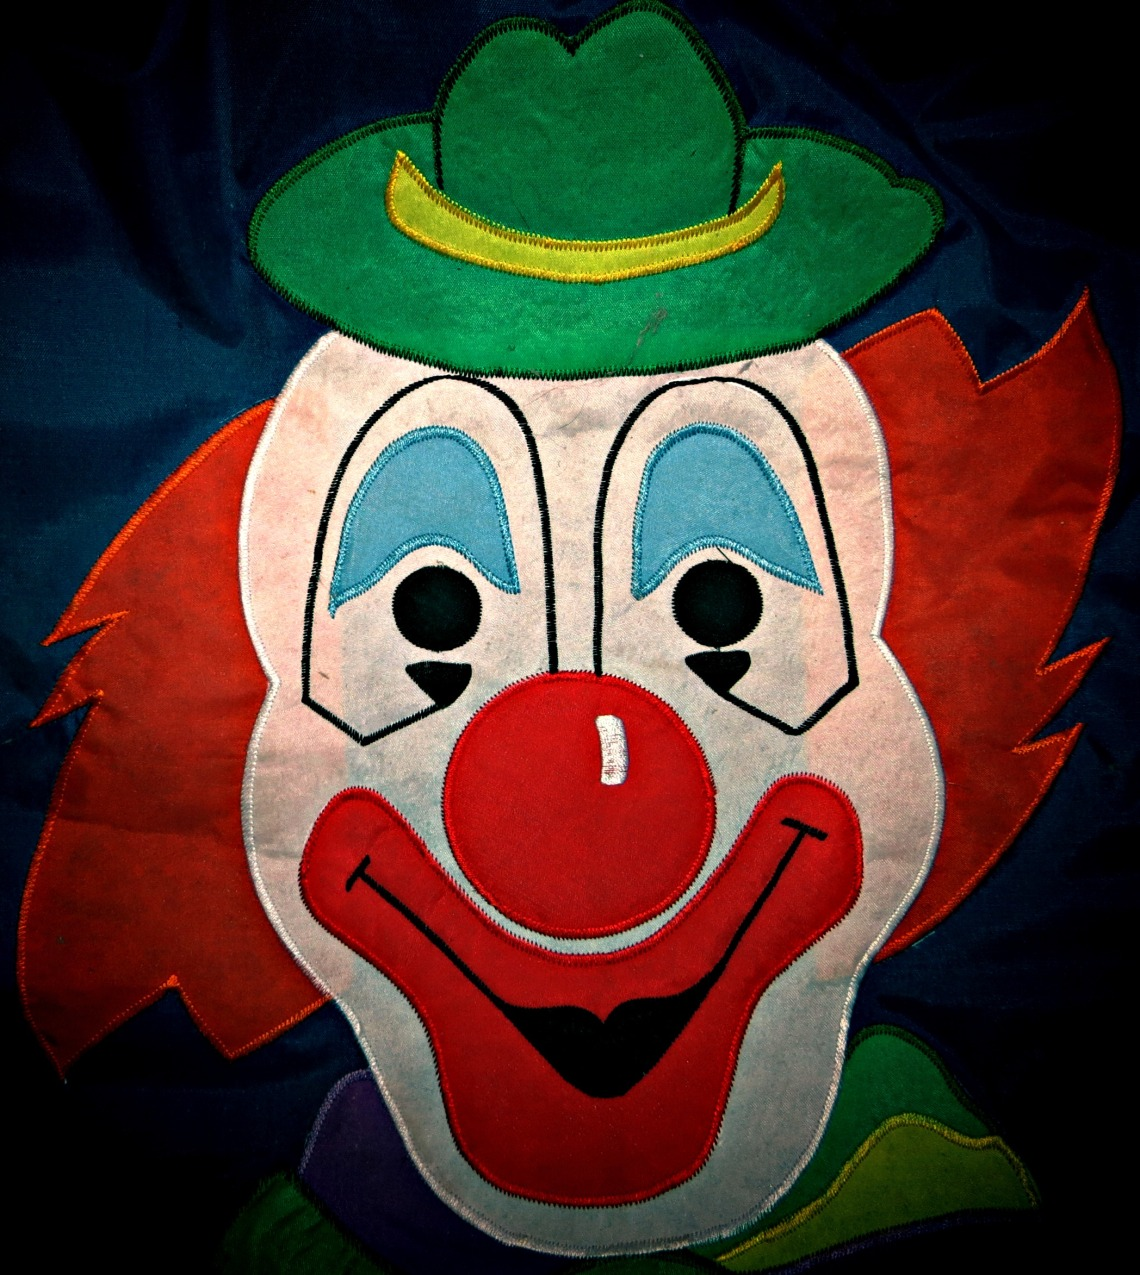 Super clown